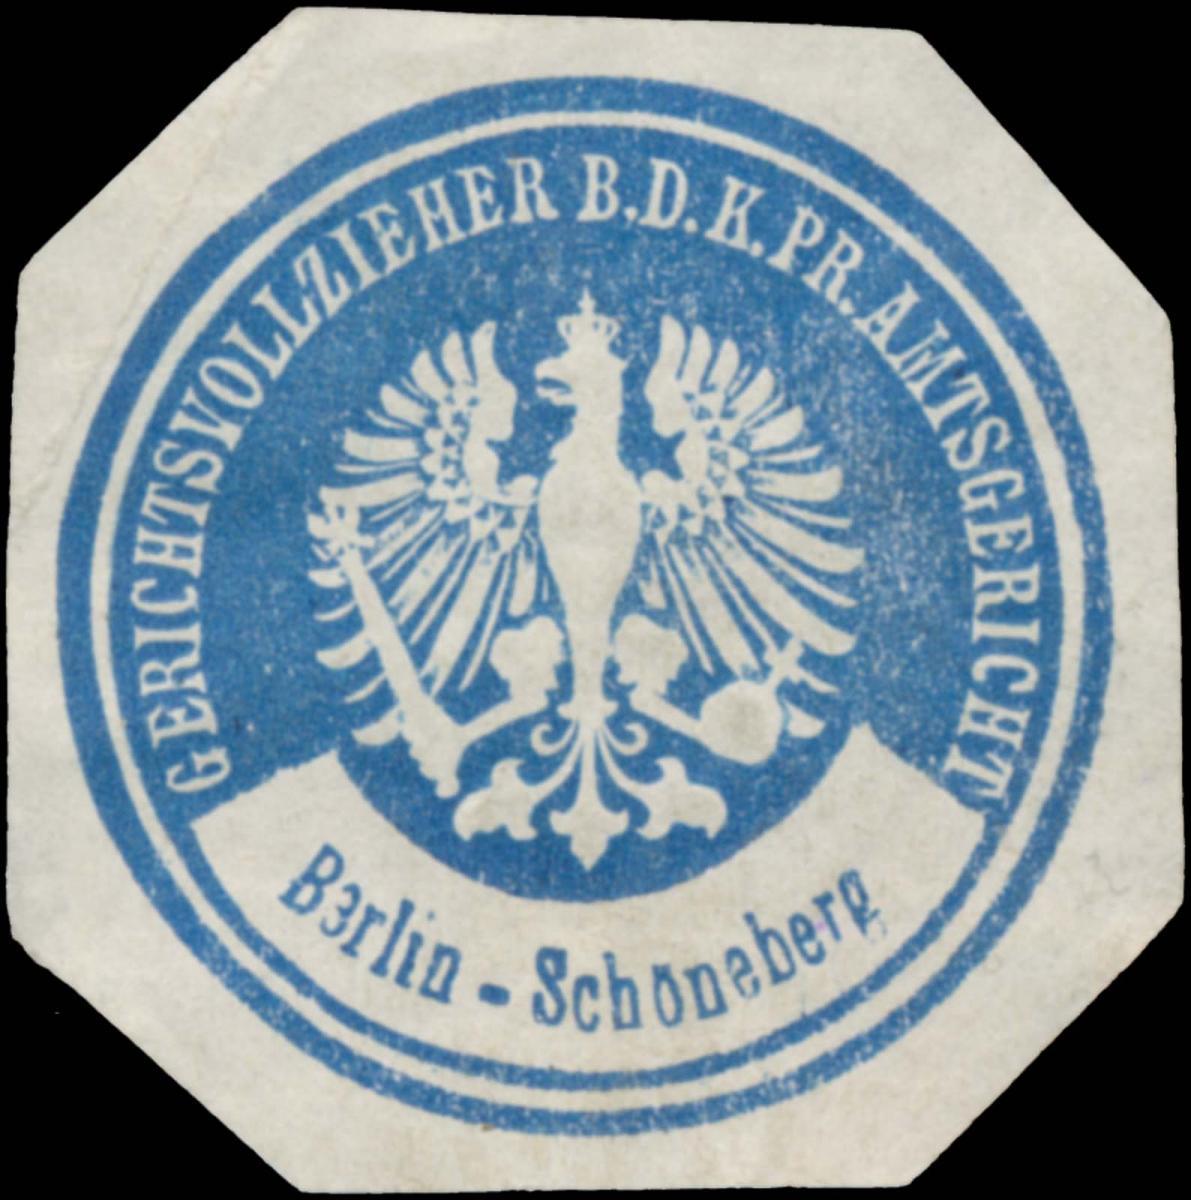 Gerichtsvollzieher b.d. K.Pr. Amtsgericht Berlin Schöneberg